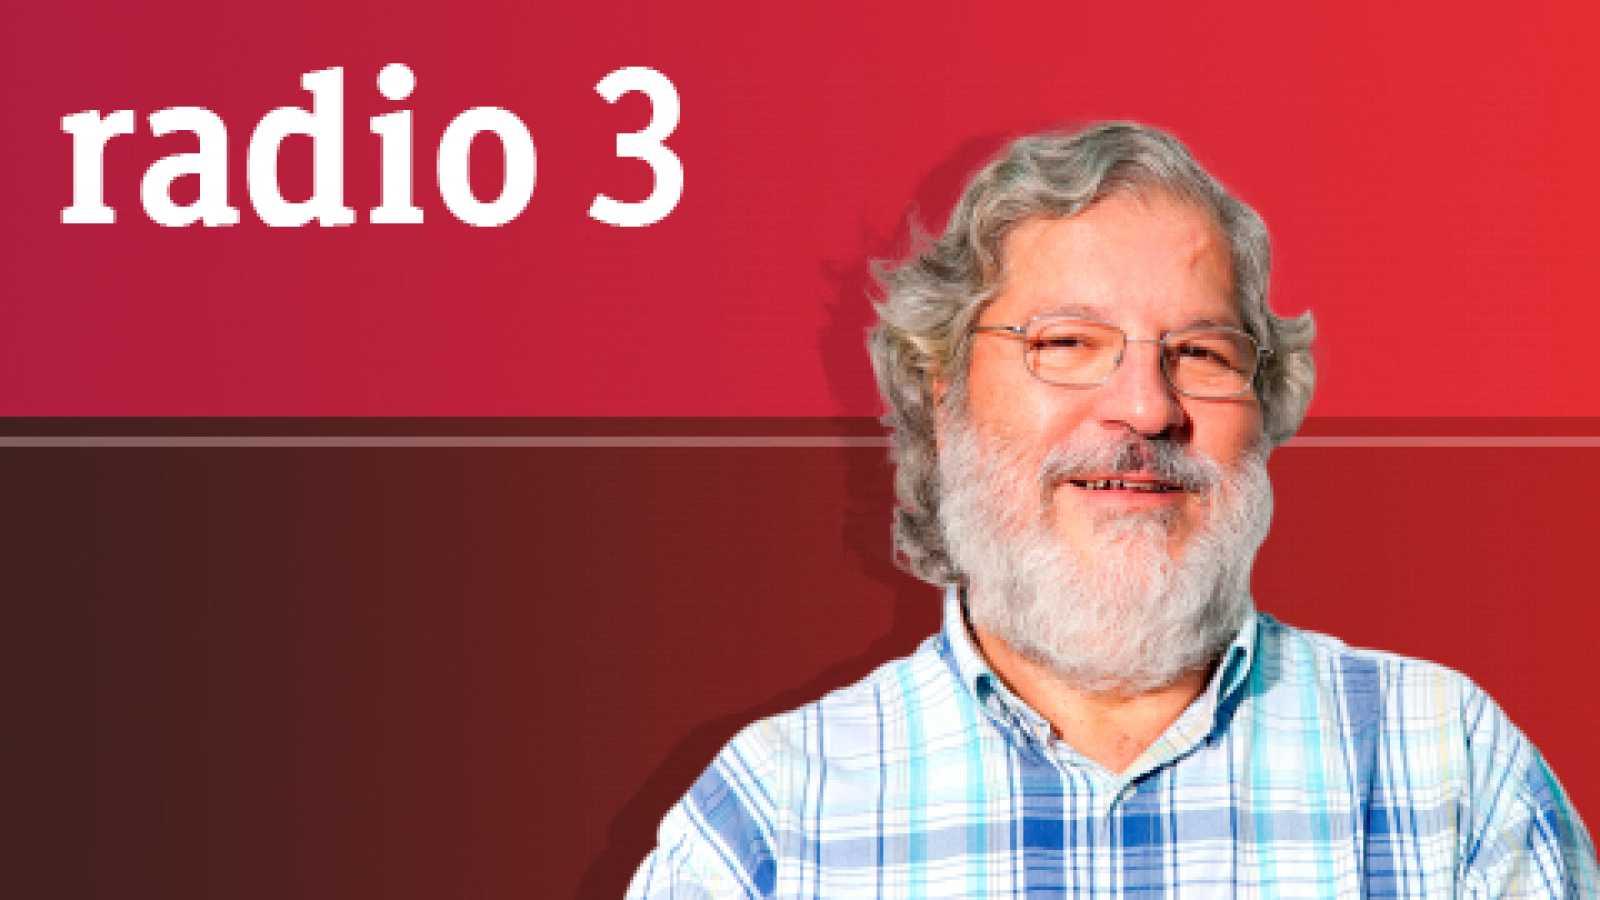 Discópolis 11.082 - Yecla 2: Daniel Garcia Trio 2 - 21/09/20 - escuchar ahora